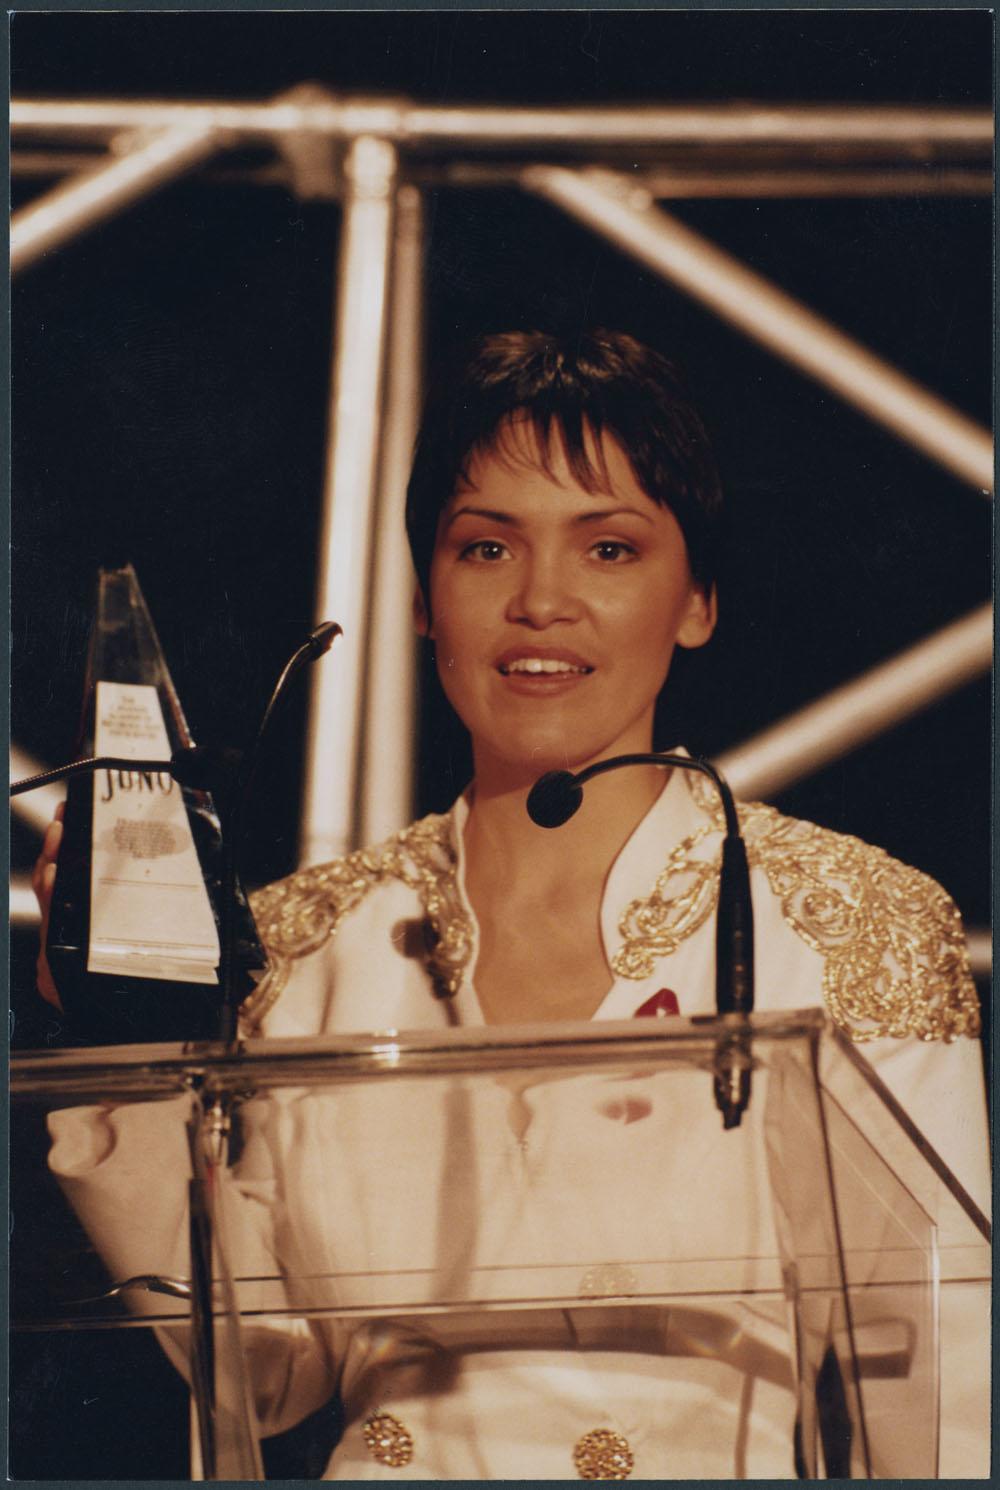 Photo of Susan Aglukark holding a Juno Award, 1995.